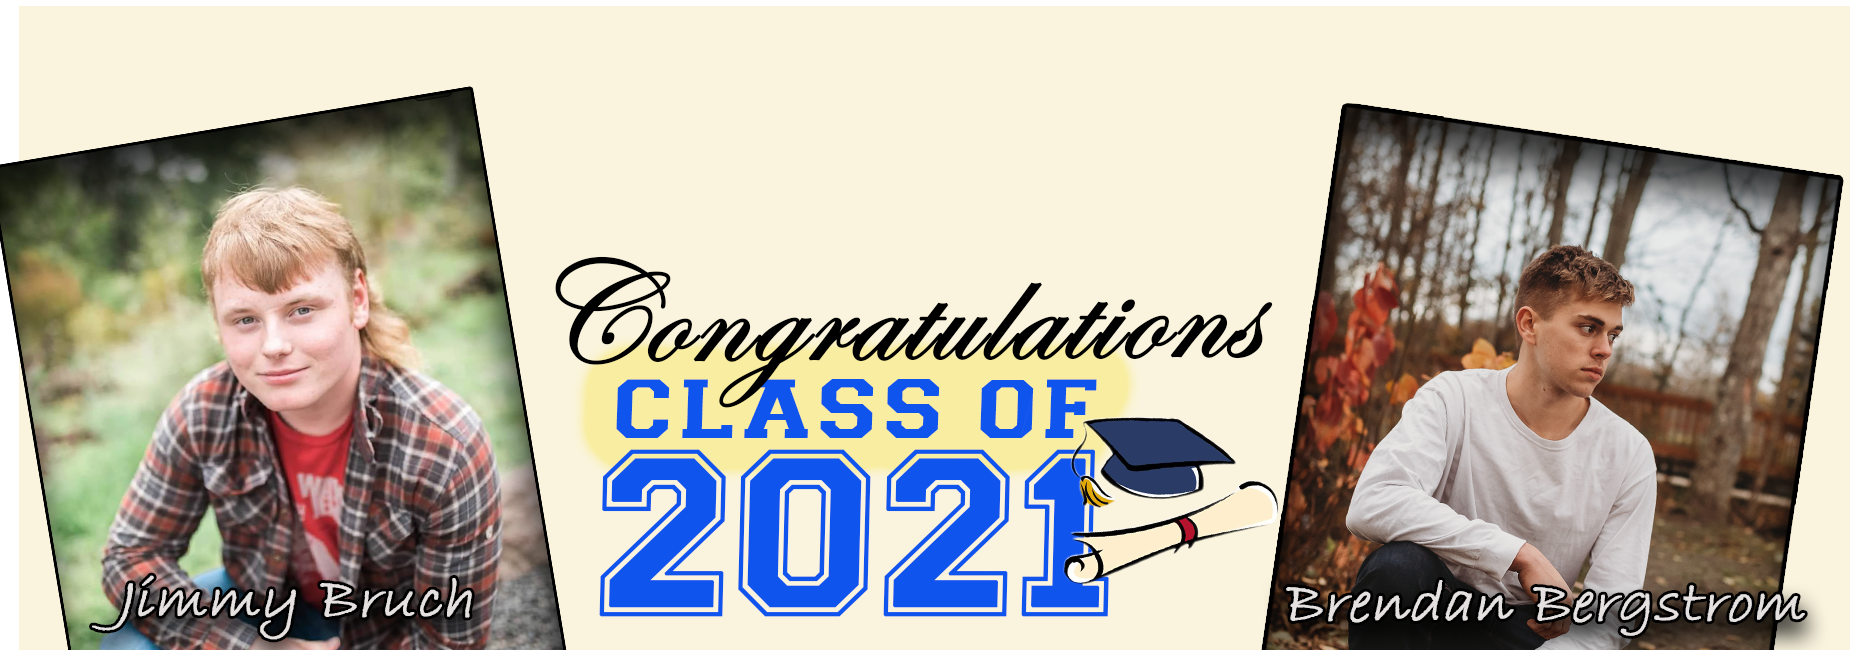 Class of 2021: J.Bruch and B. Bergstrom